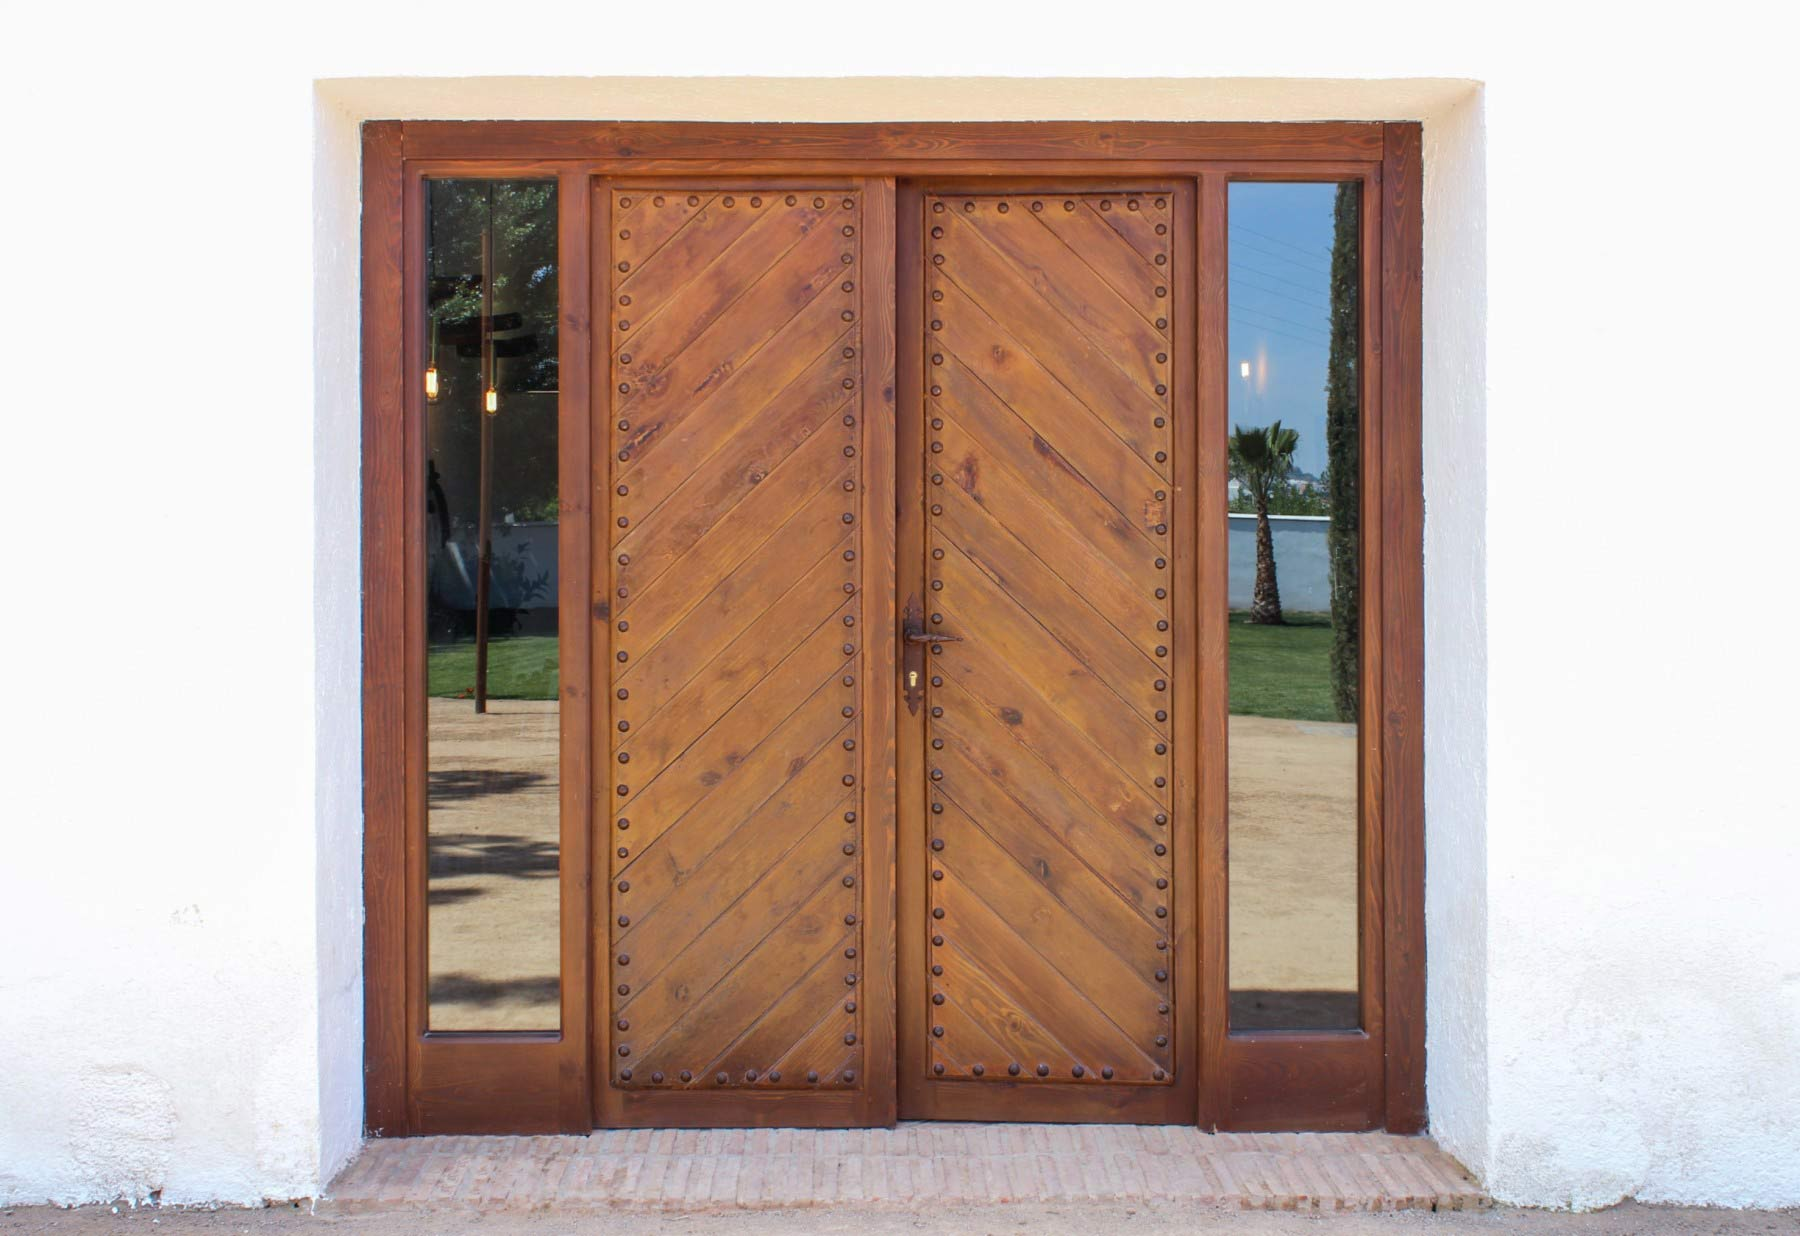 Portón de madera rústica en forma de espiga